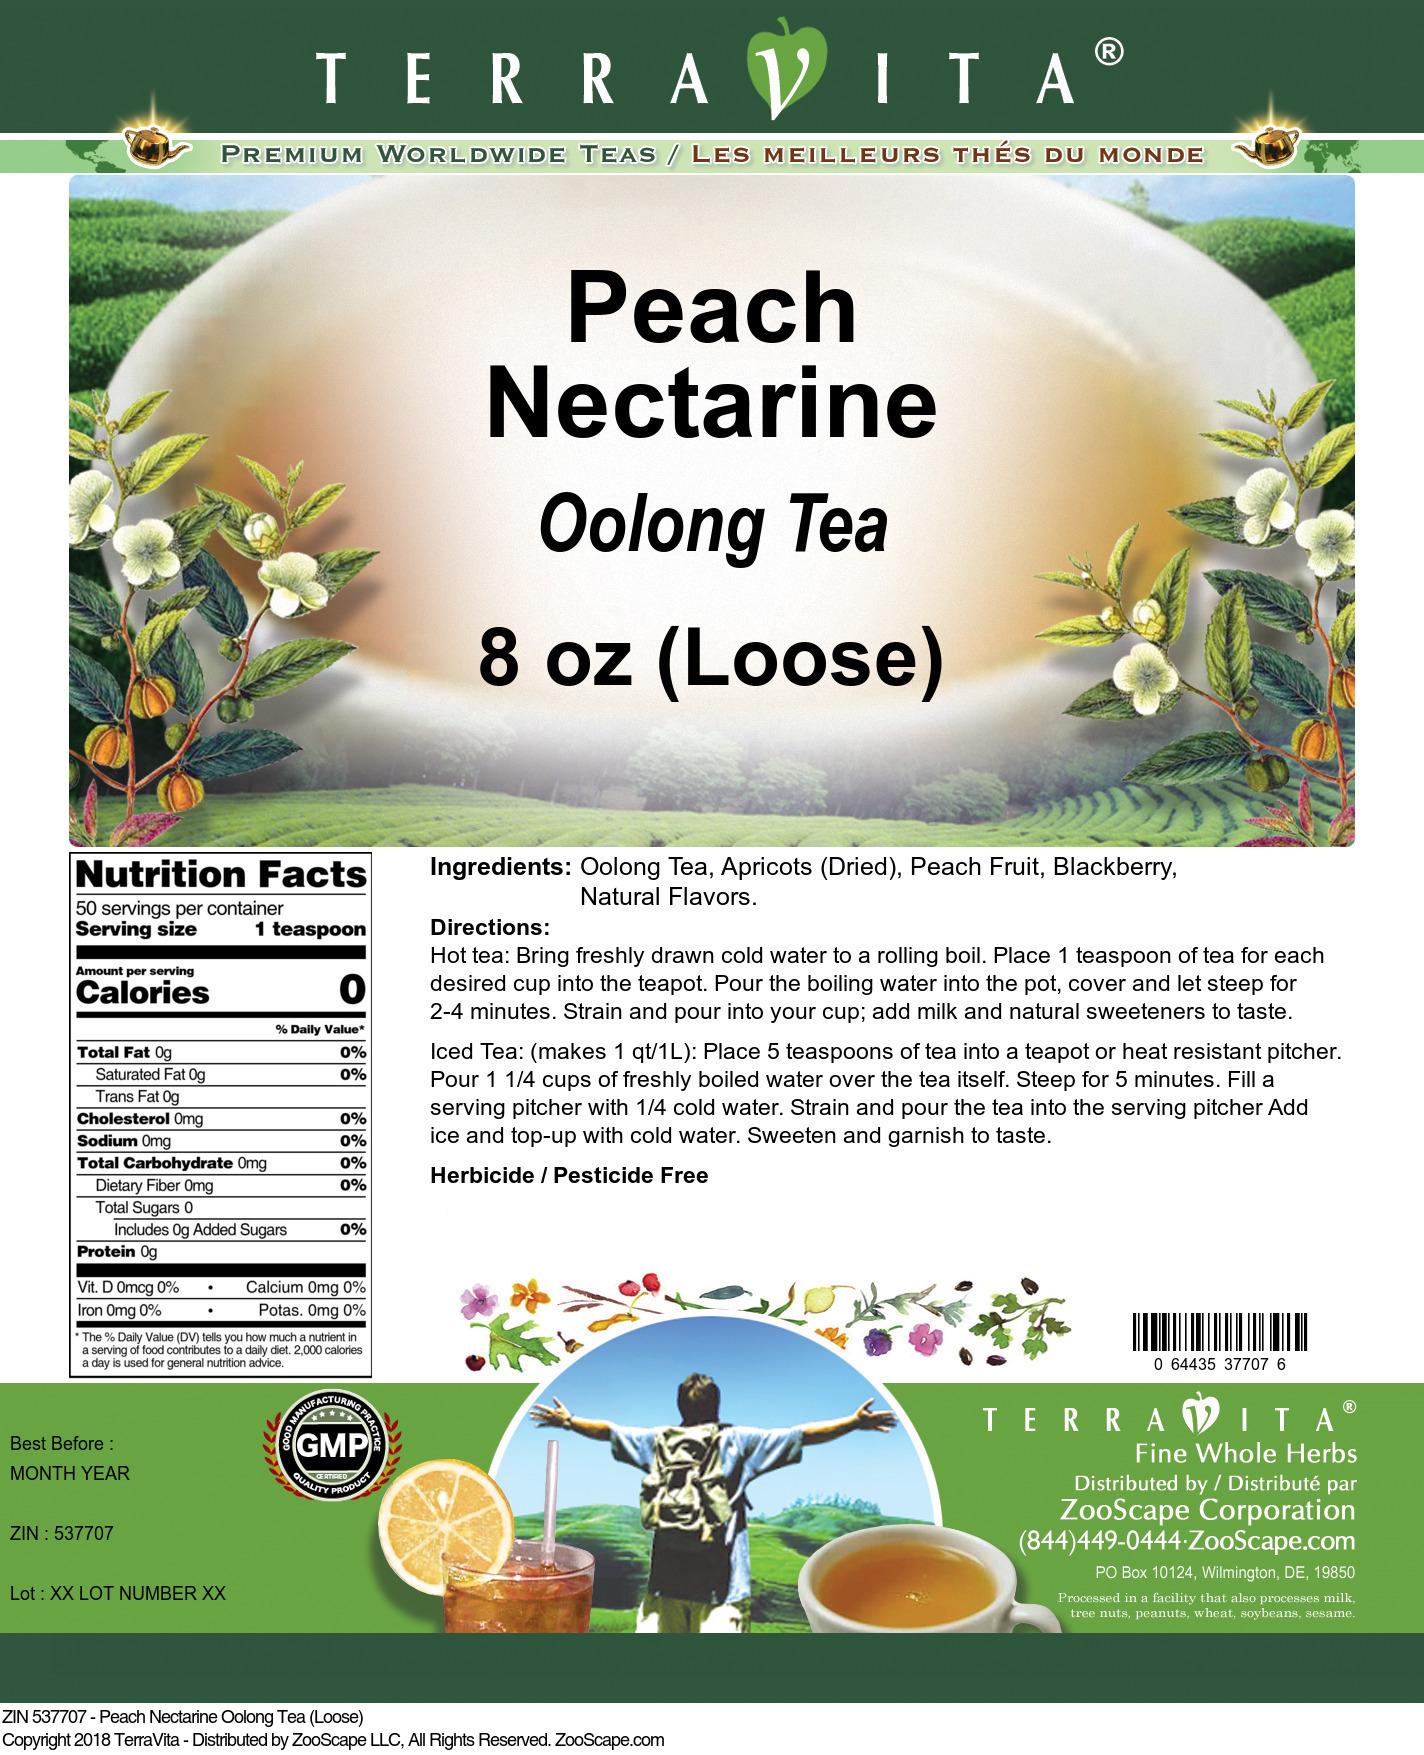 Peach Nectarine Oolong Tea (Loose)